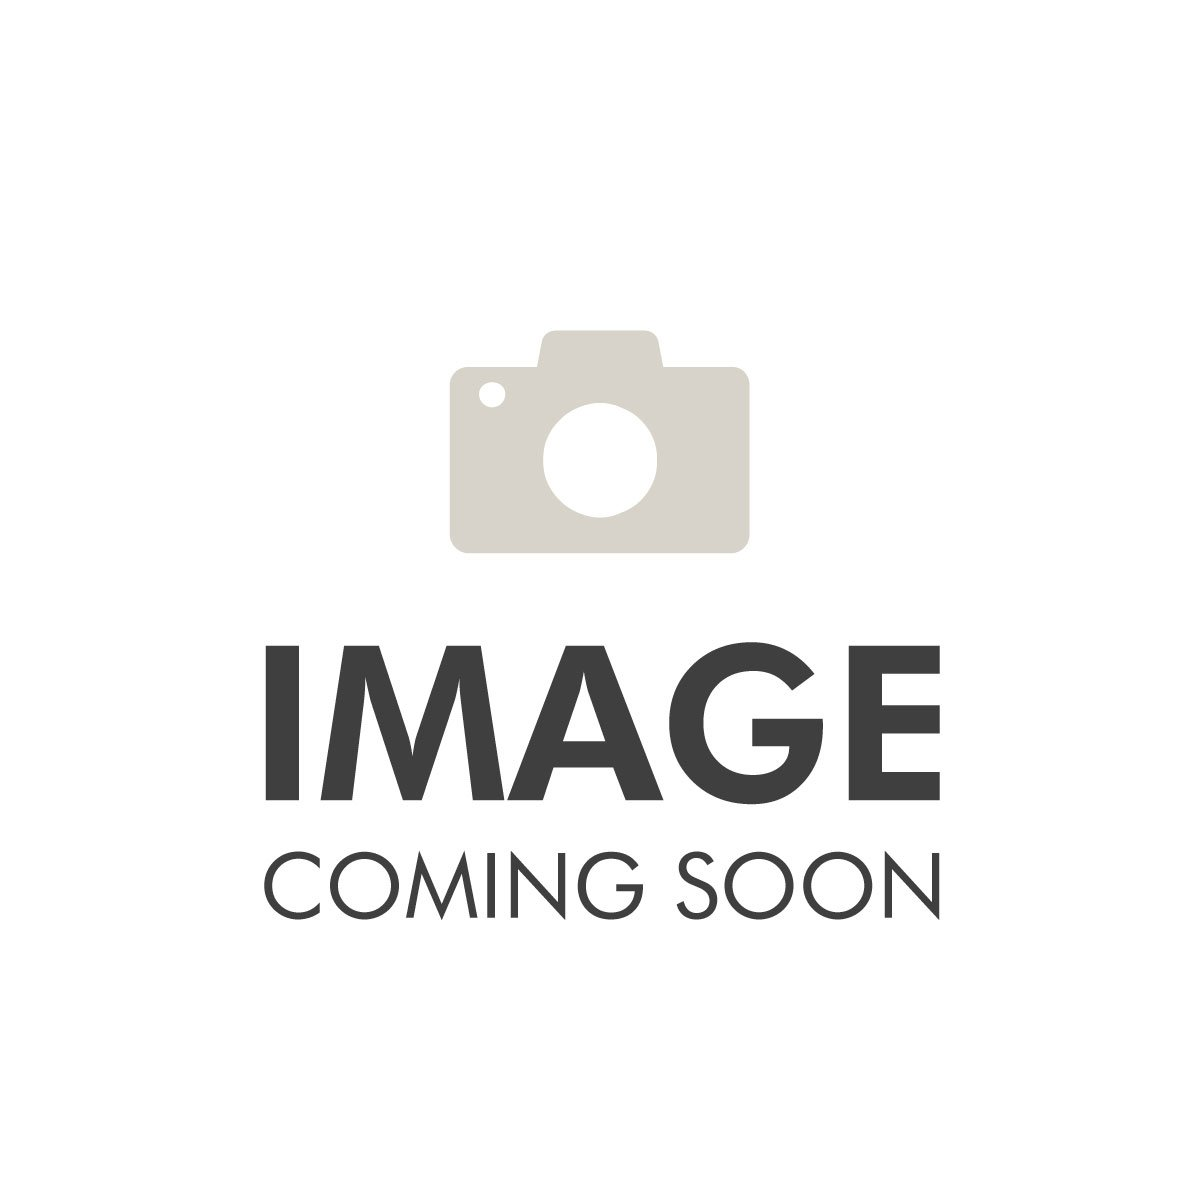 Uhlmann - Foil Lamé - Women - Stainless